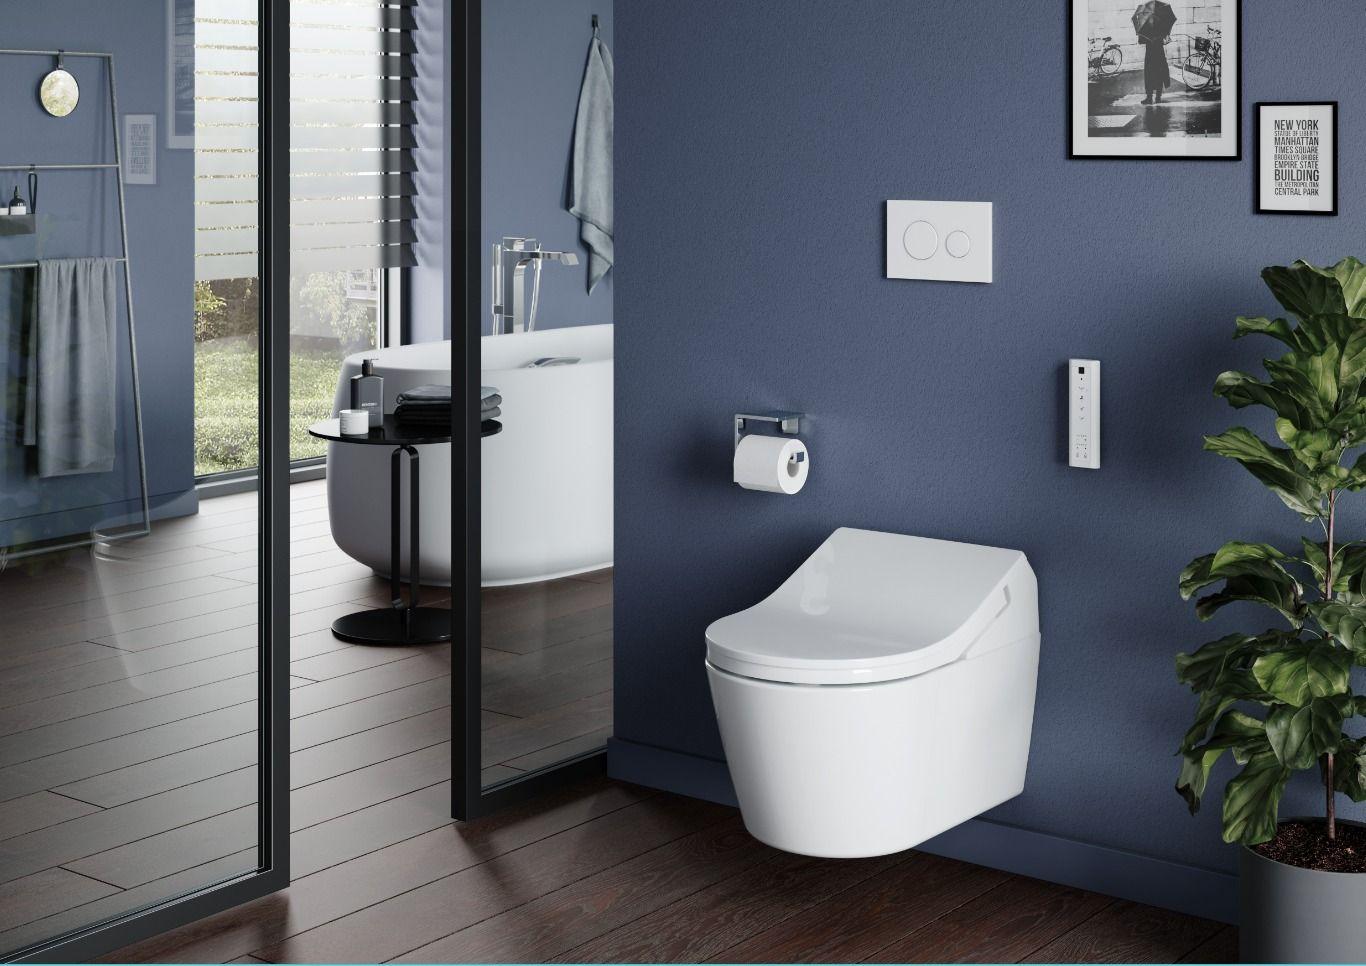 Toto Rw Dusjtoalett I 2020 Luksusbad Fjernkontroll Toalett